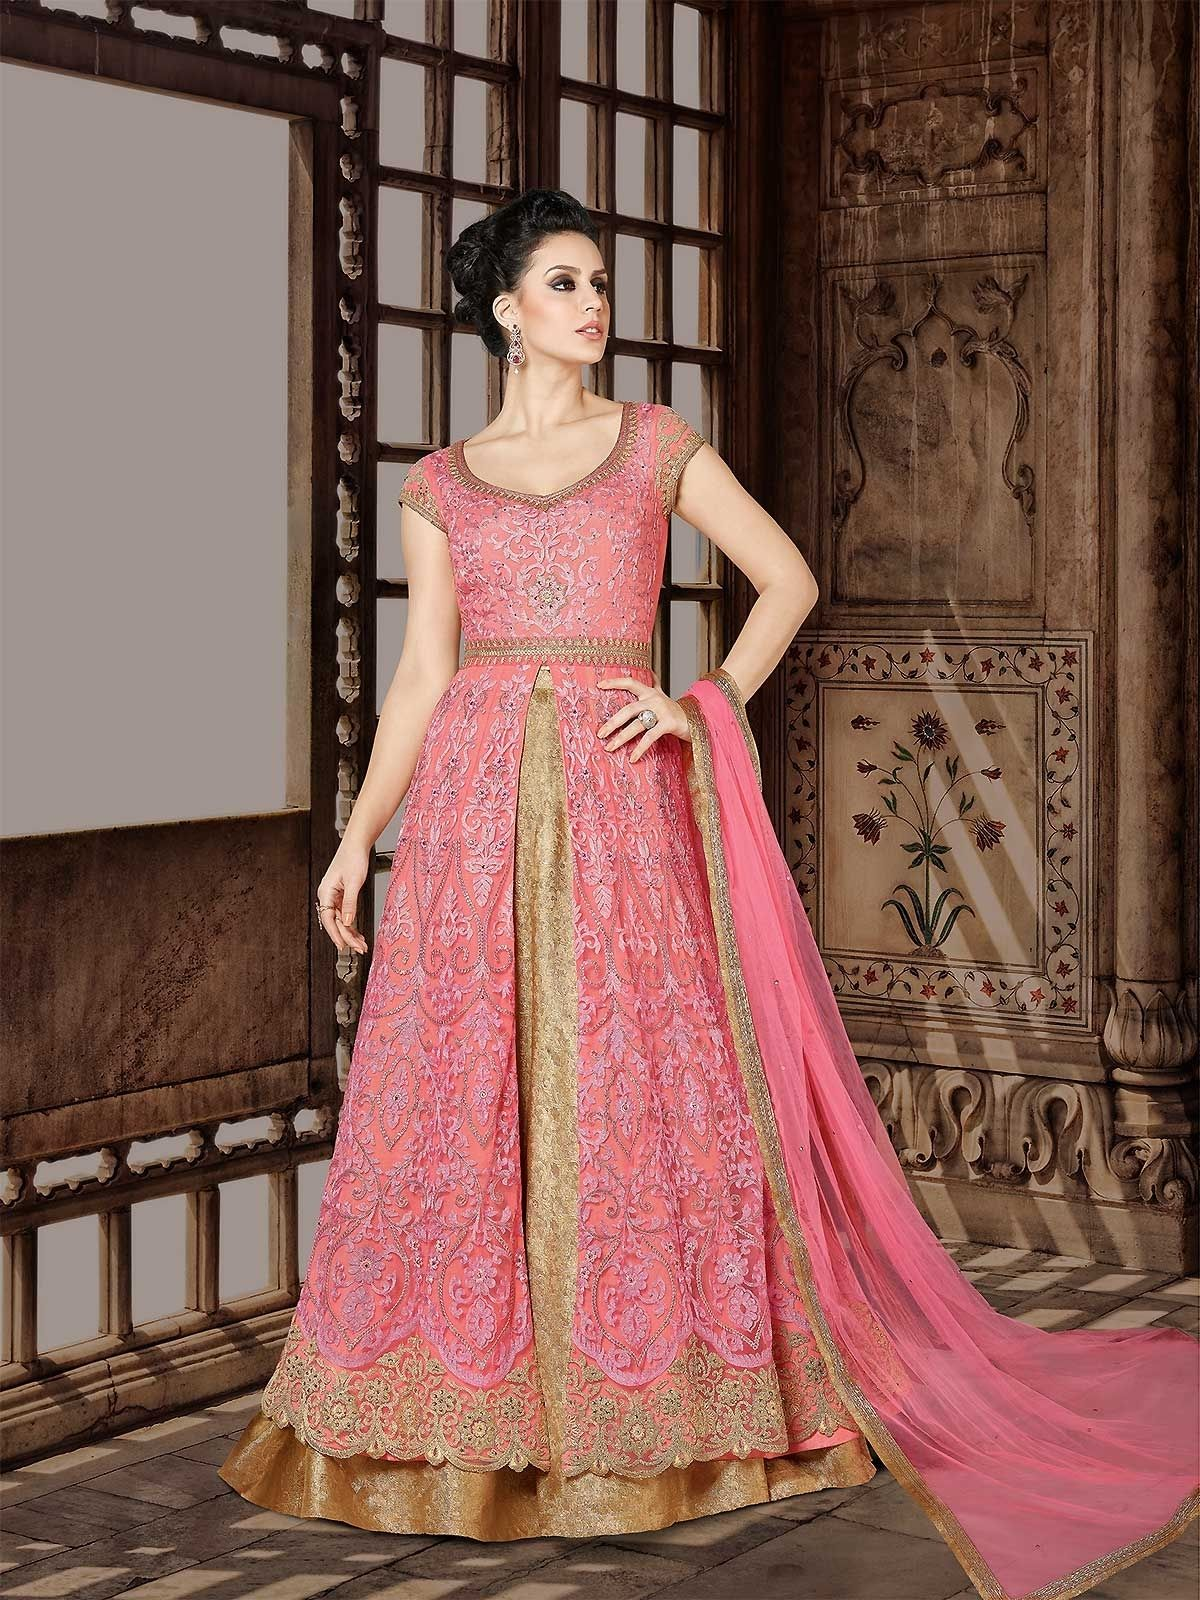 Shop bollywood pink designer indian anarkali dress with dupatta and ...